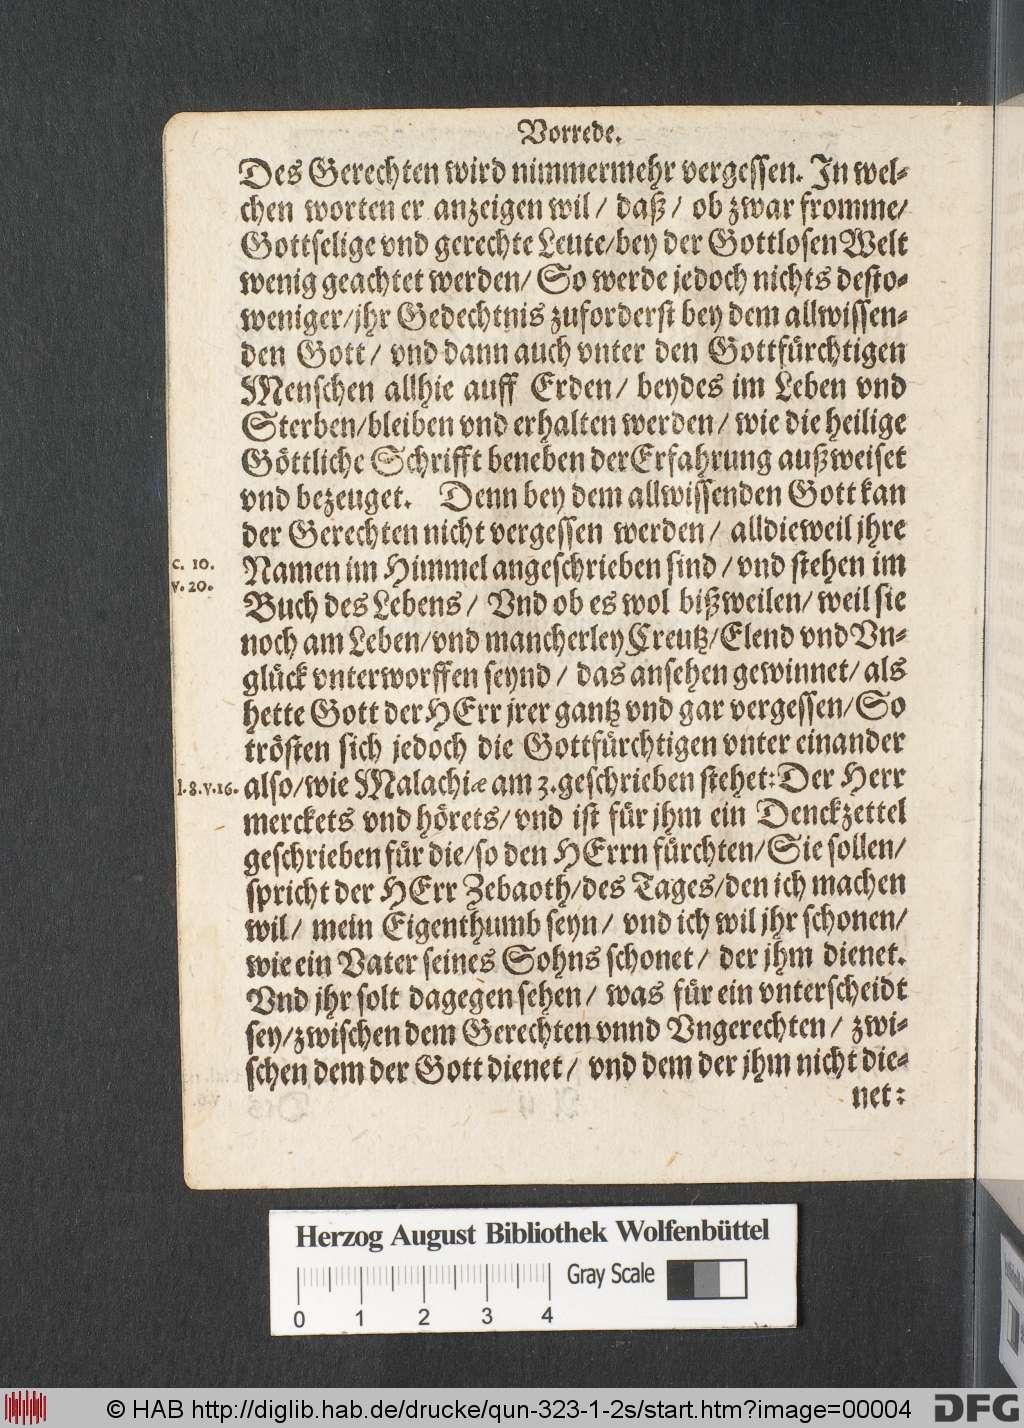 http://diglib.hab.de/drucke/qun-323-1-2s/00004.jpg